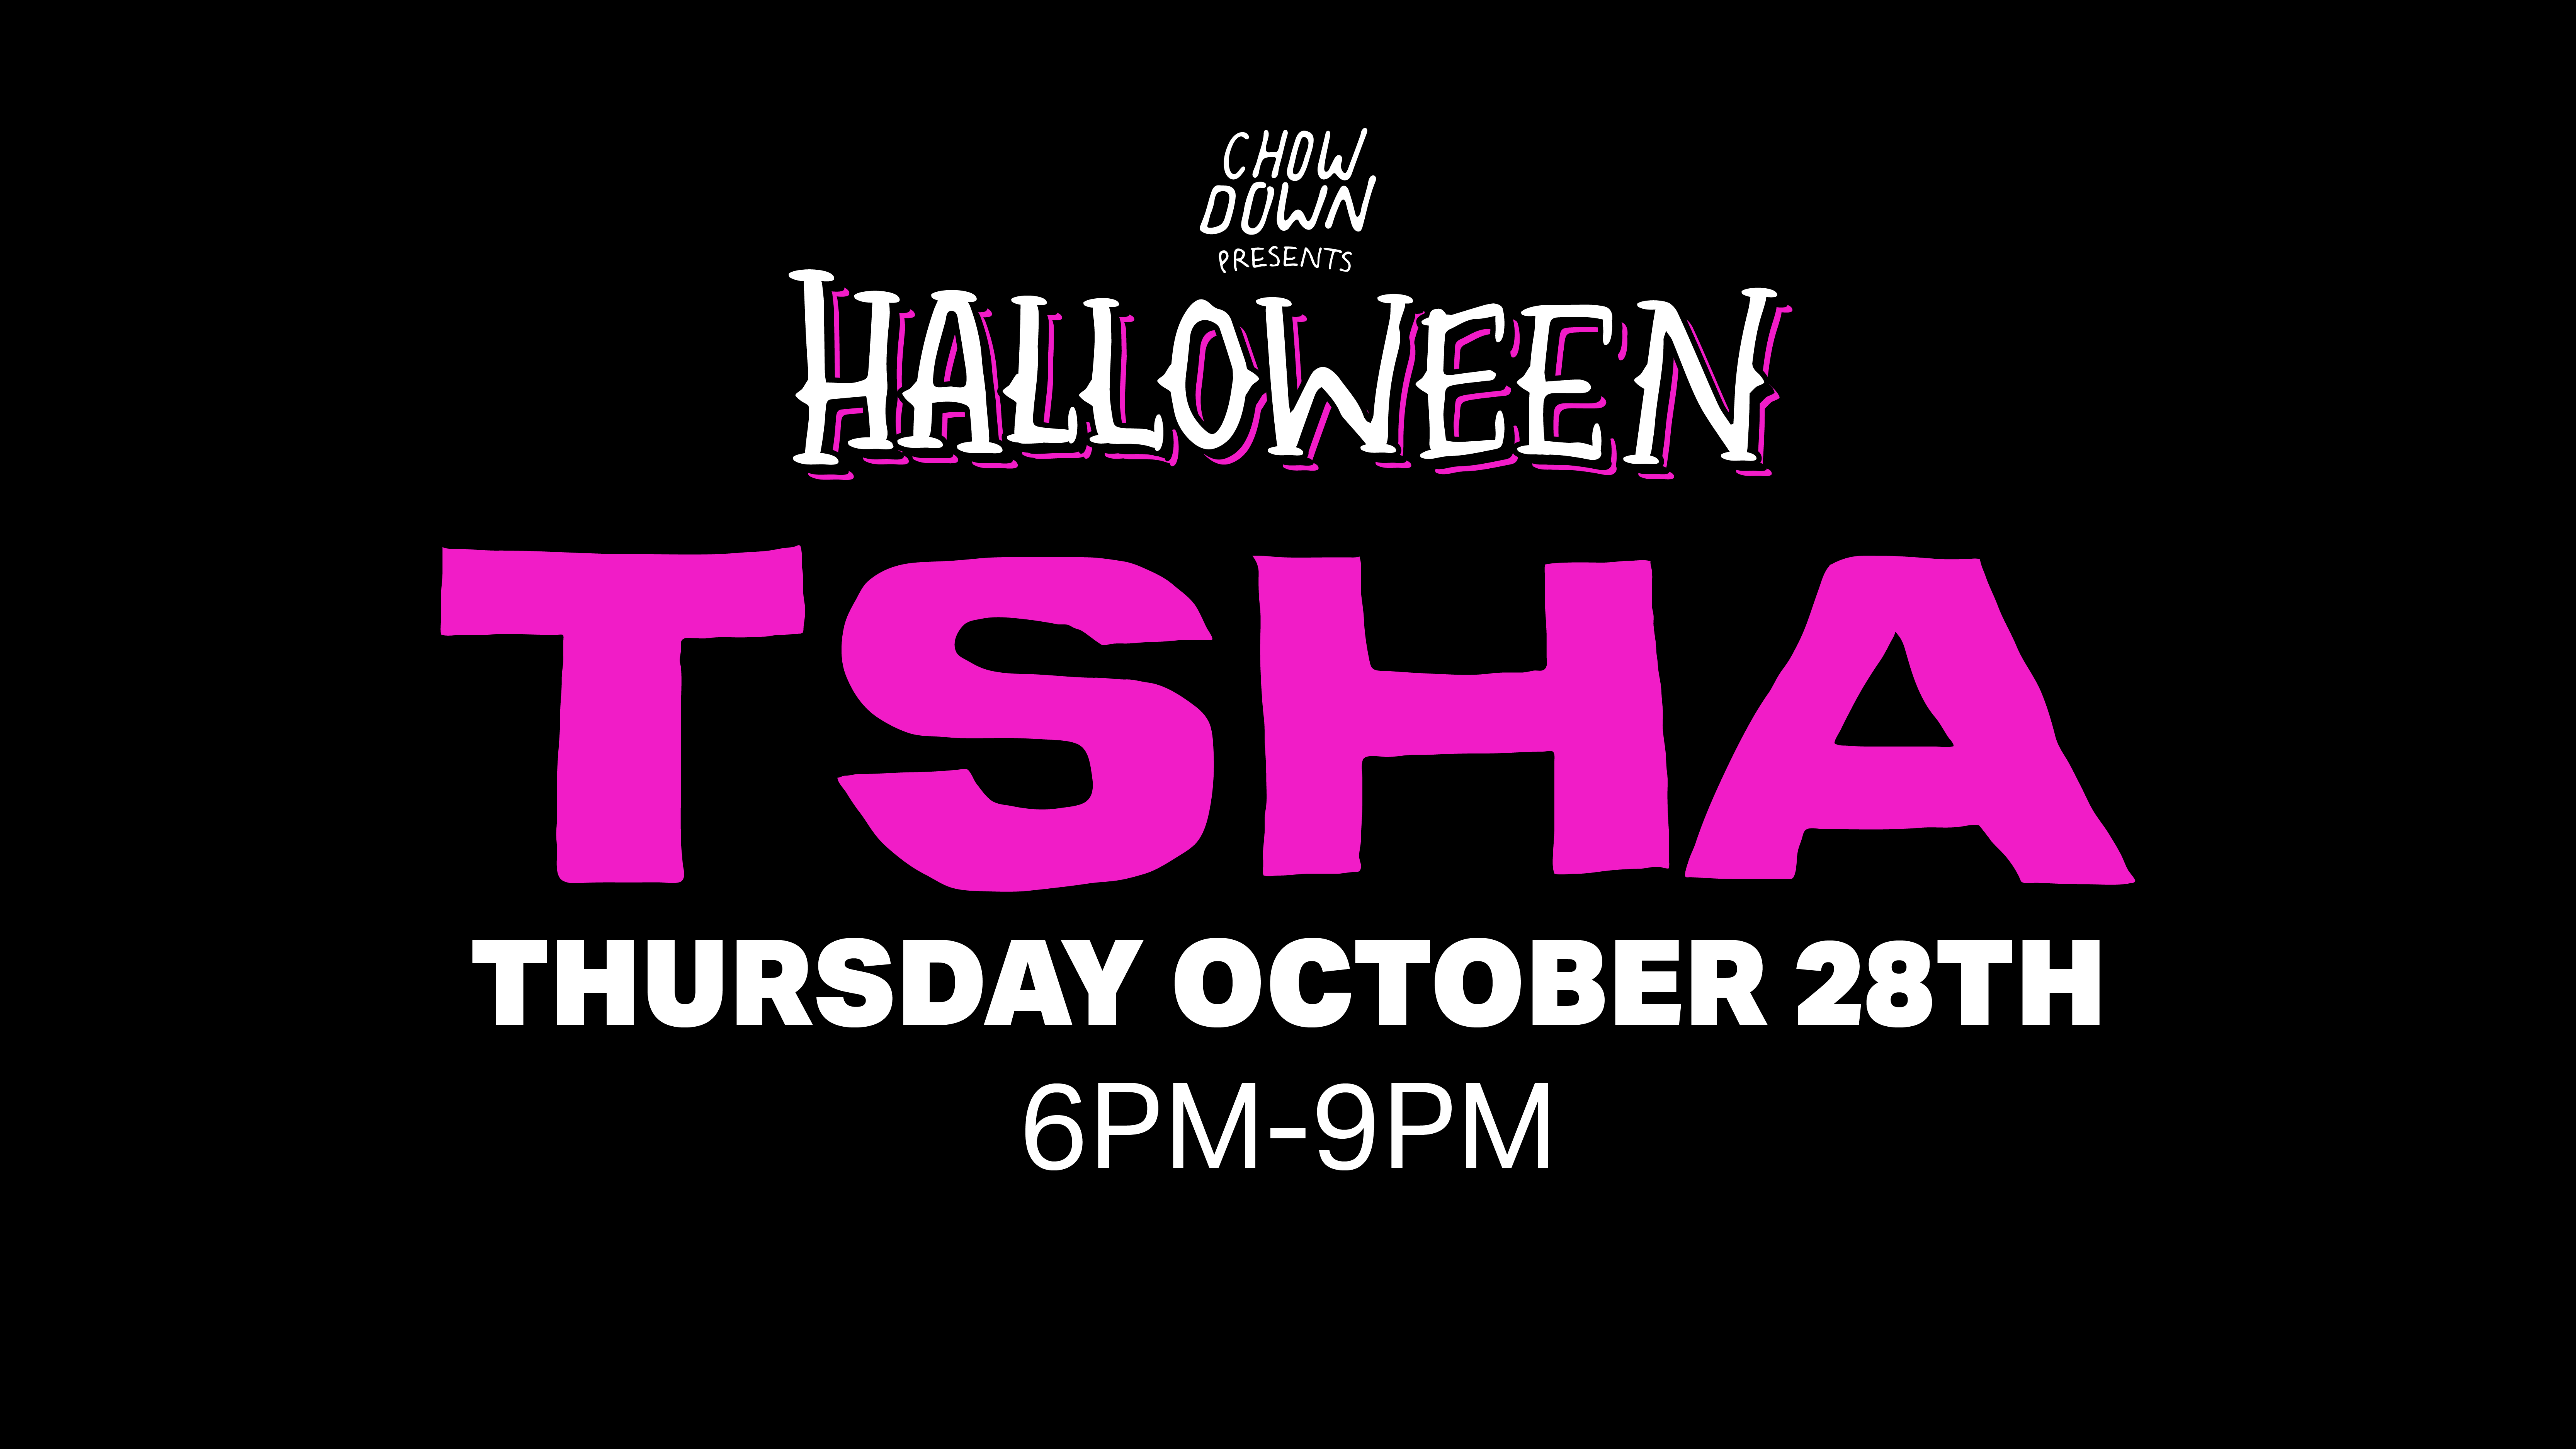 Chow Down Halloween: Thursday 28th October – TSHA (DJ Set)